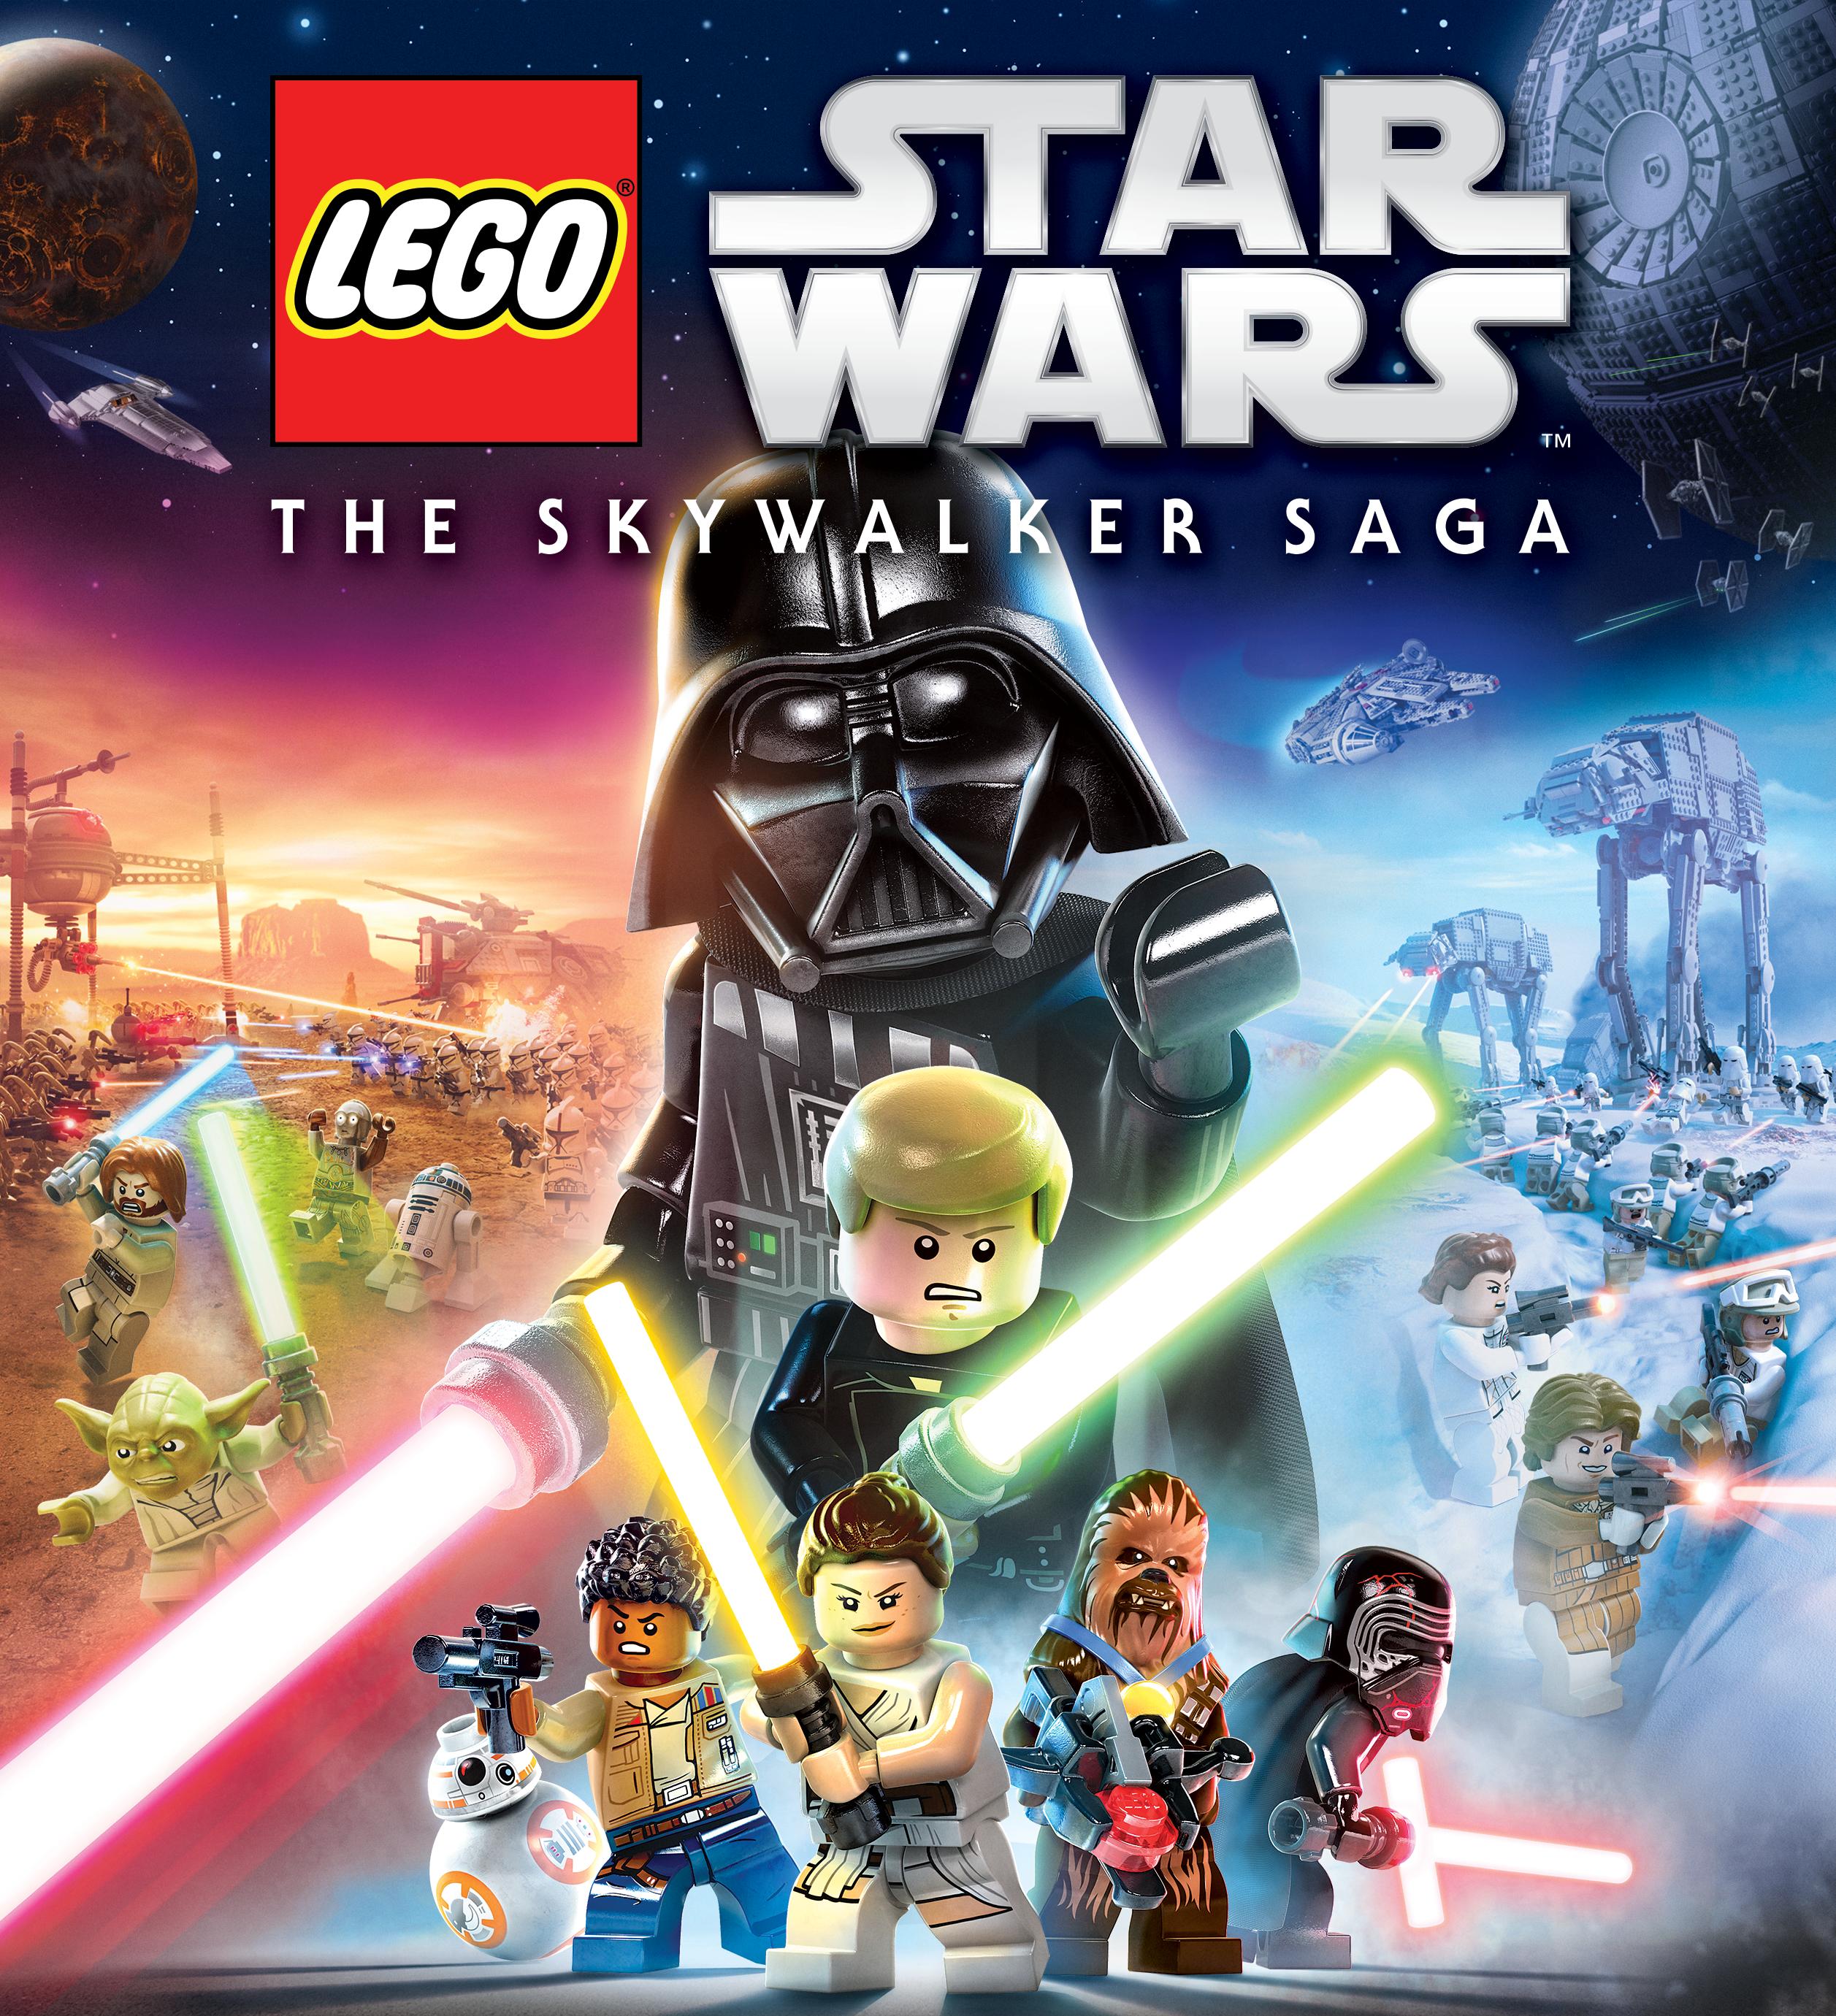 Star Wars The Skywalker Saga Artwork